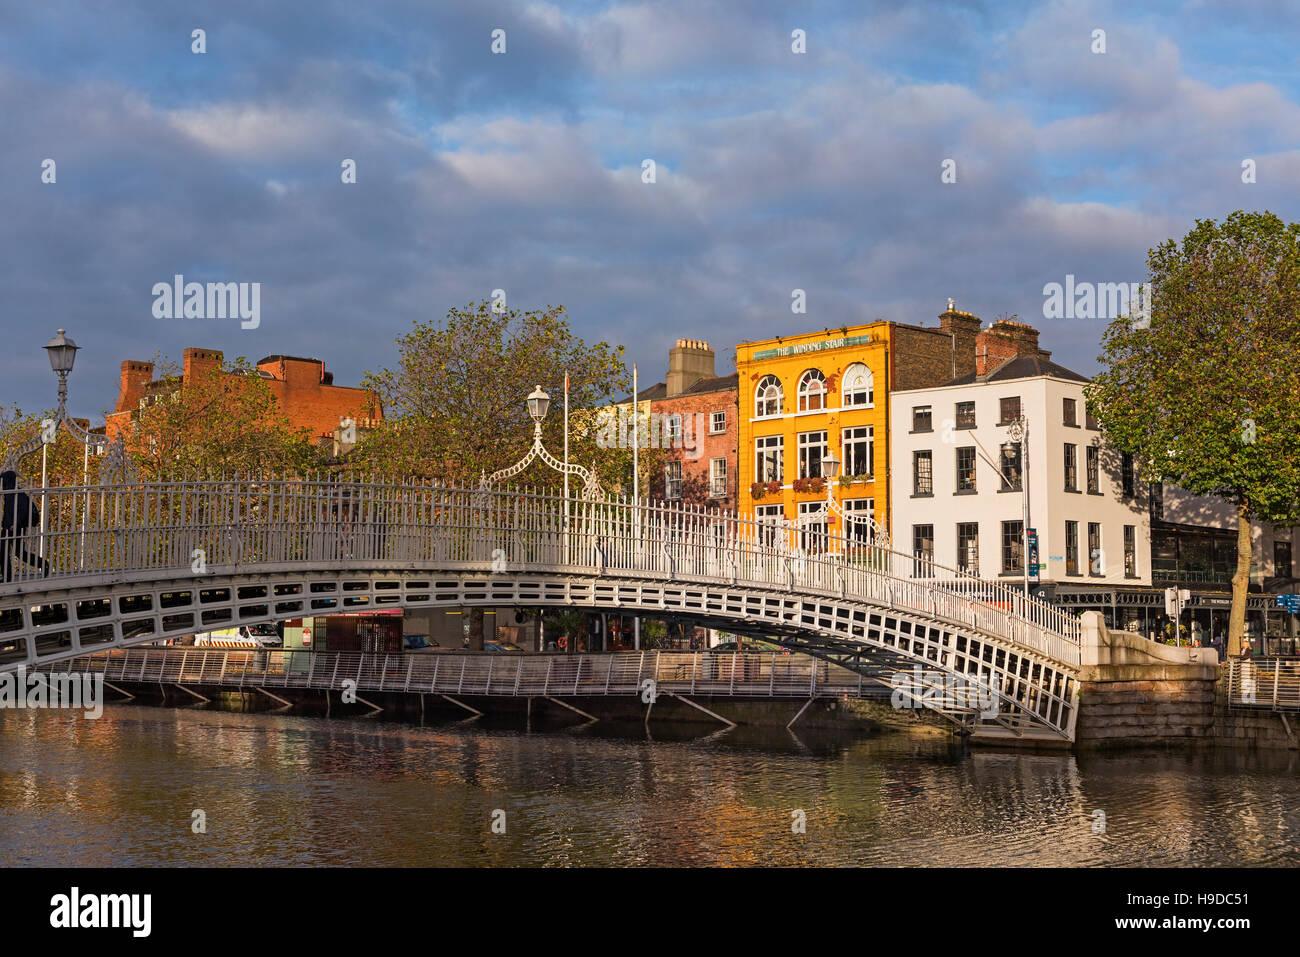 Ha'penny bridge Dublin Ireland - Stock Image